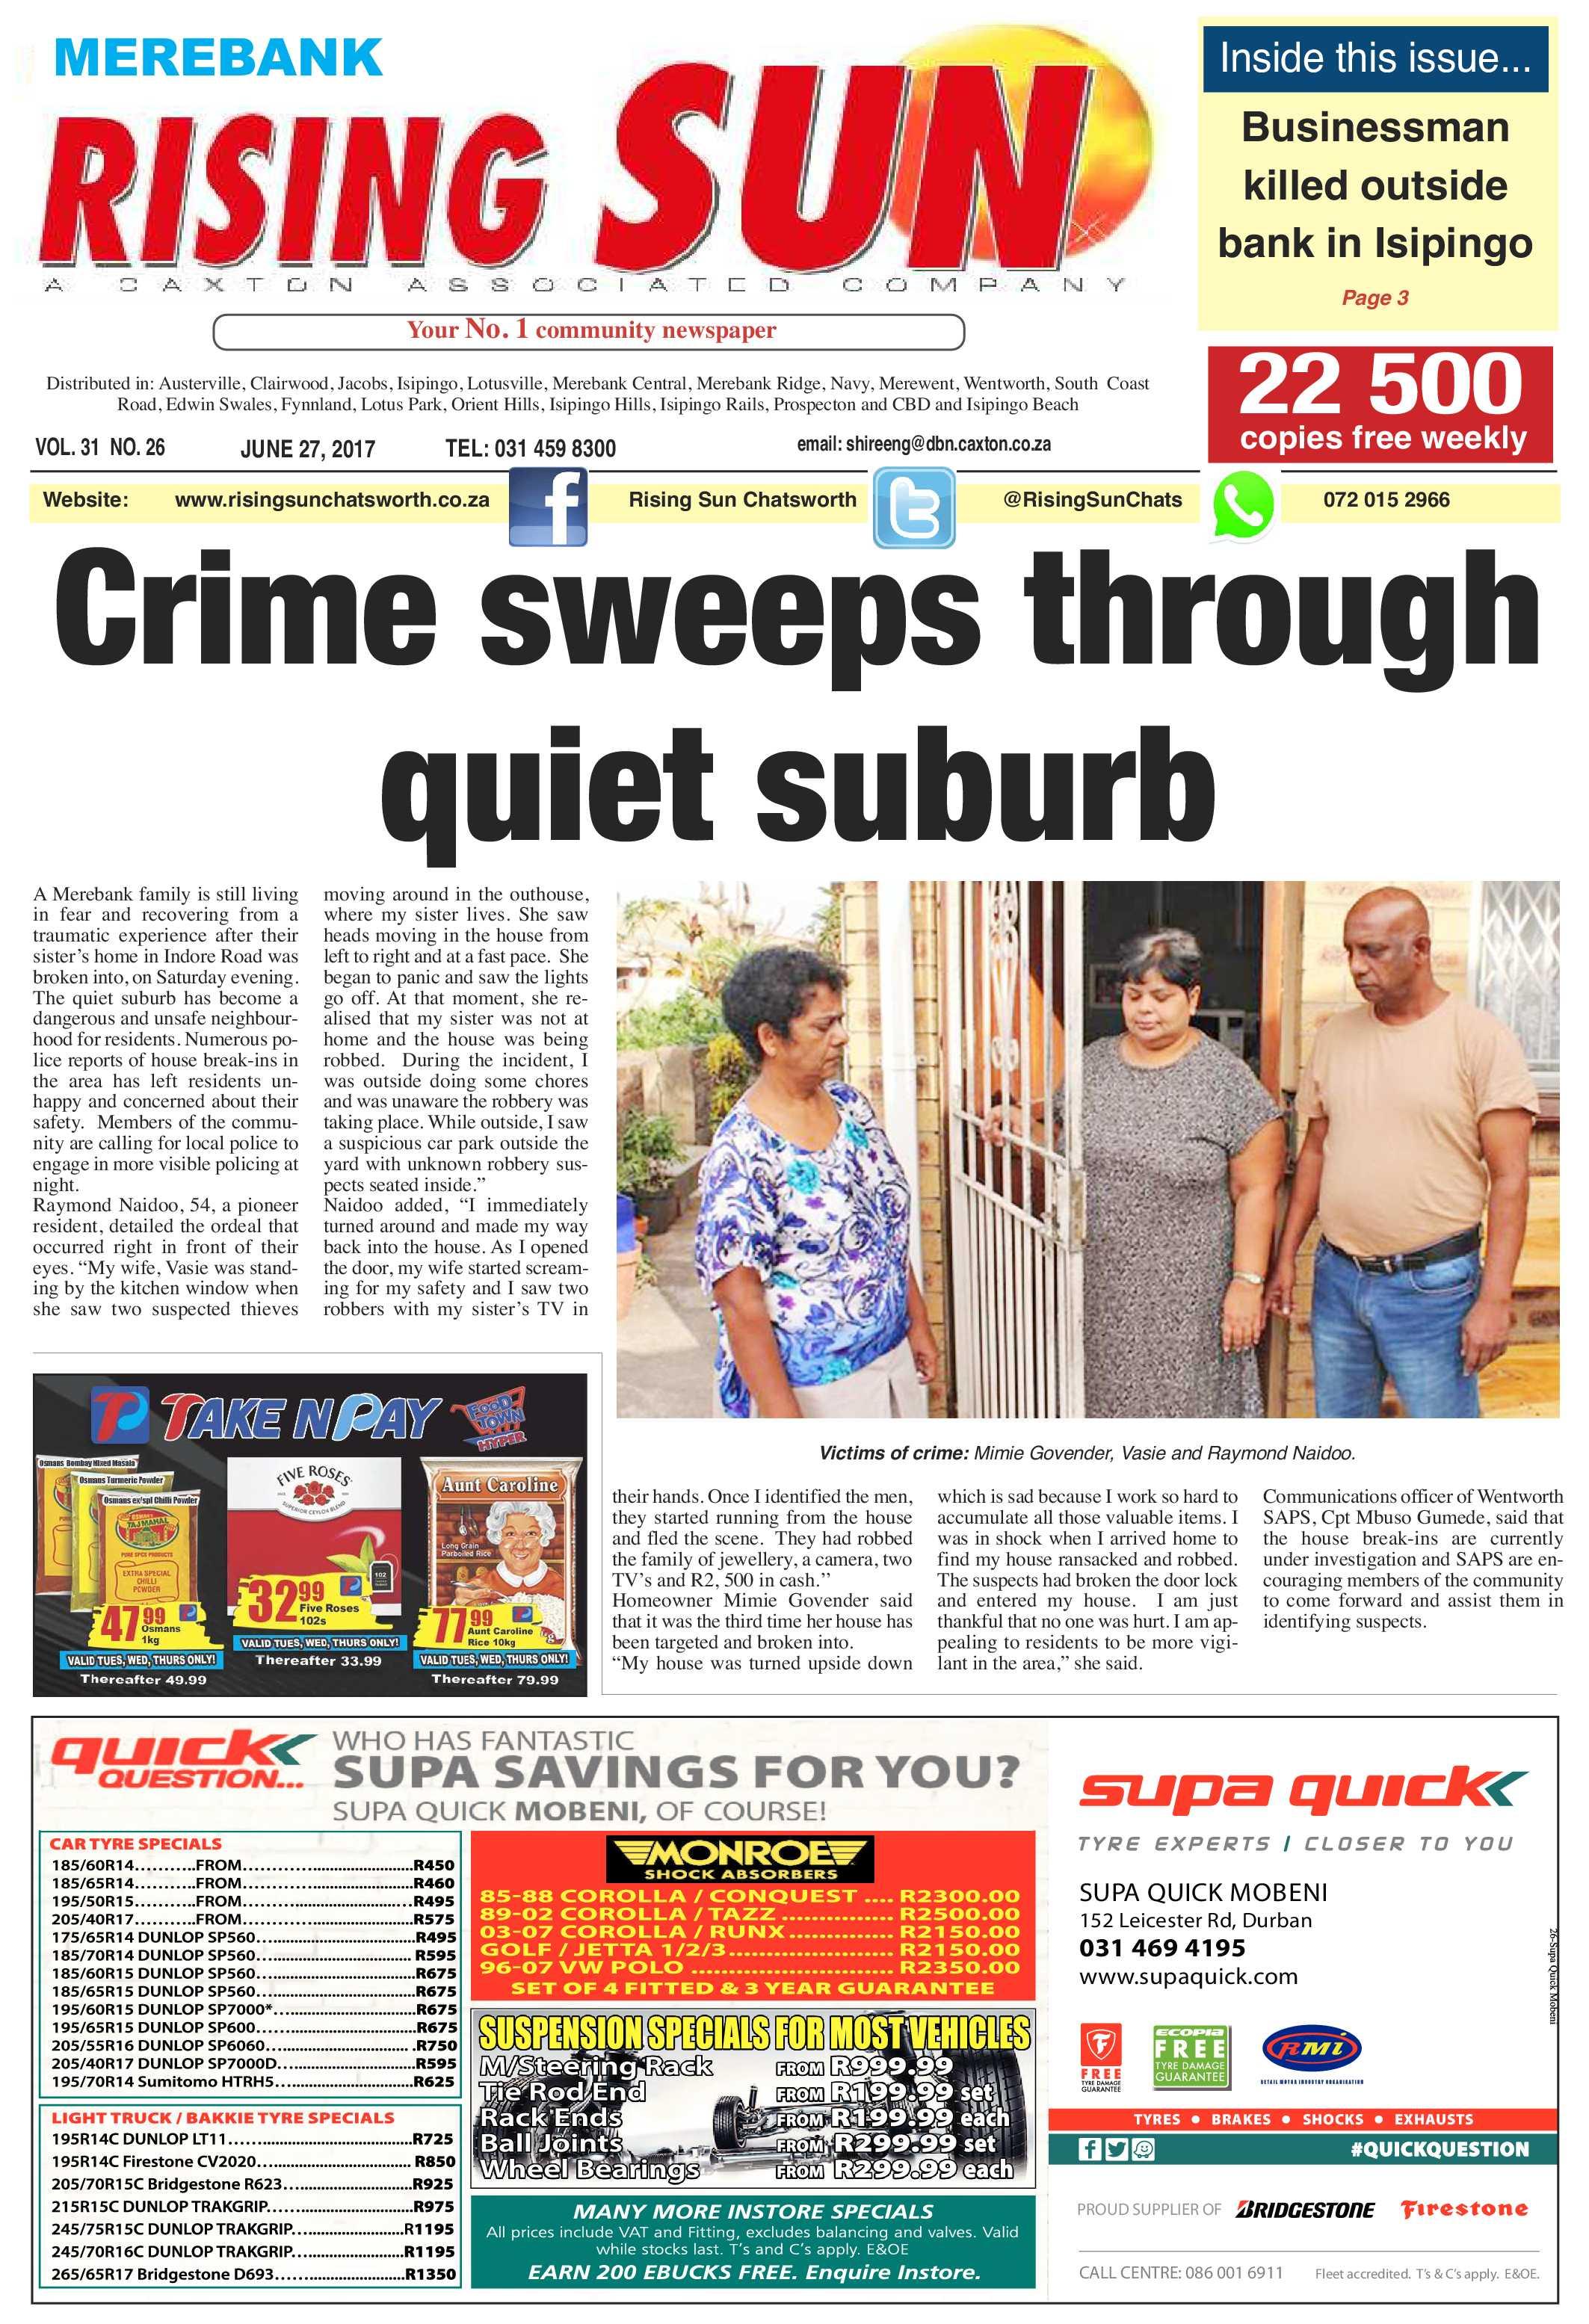 Retired Police Cars For Sale >> Rising Sun Merebank, June 27 - Rising Sun Chatsworth